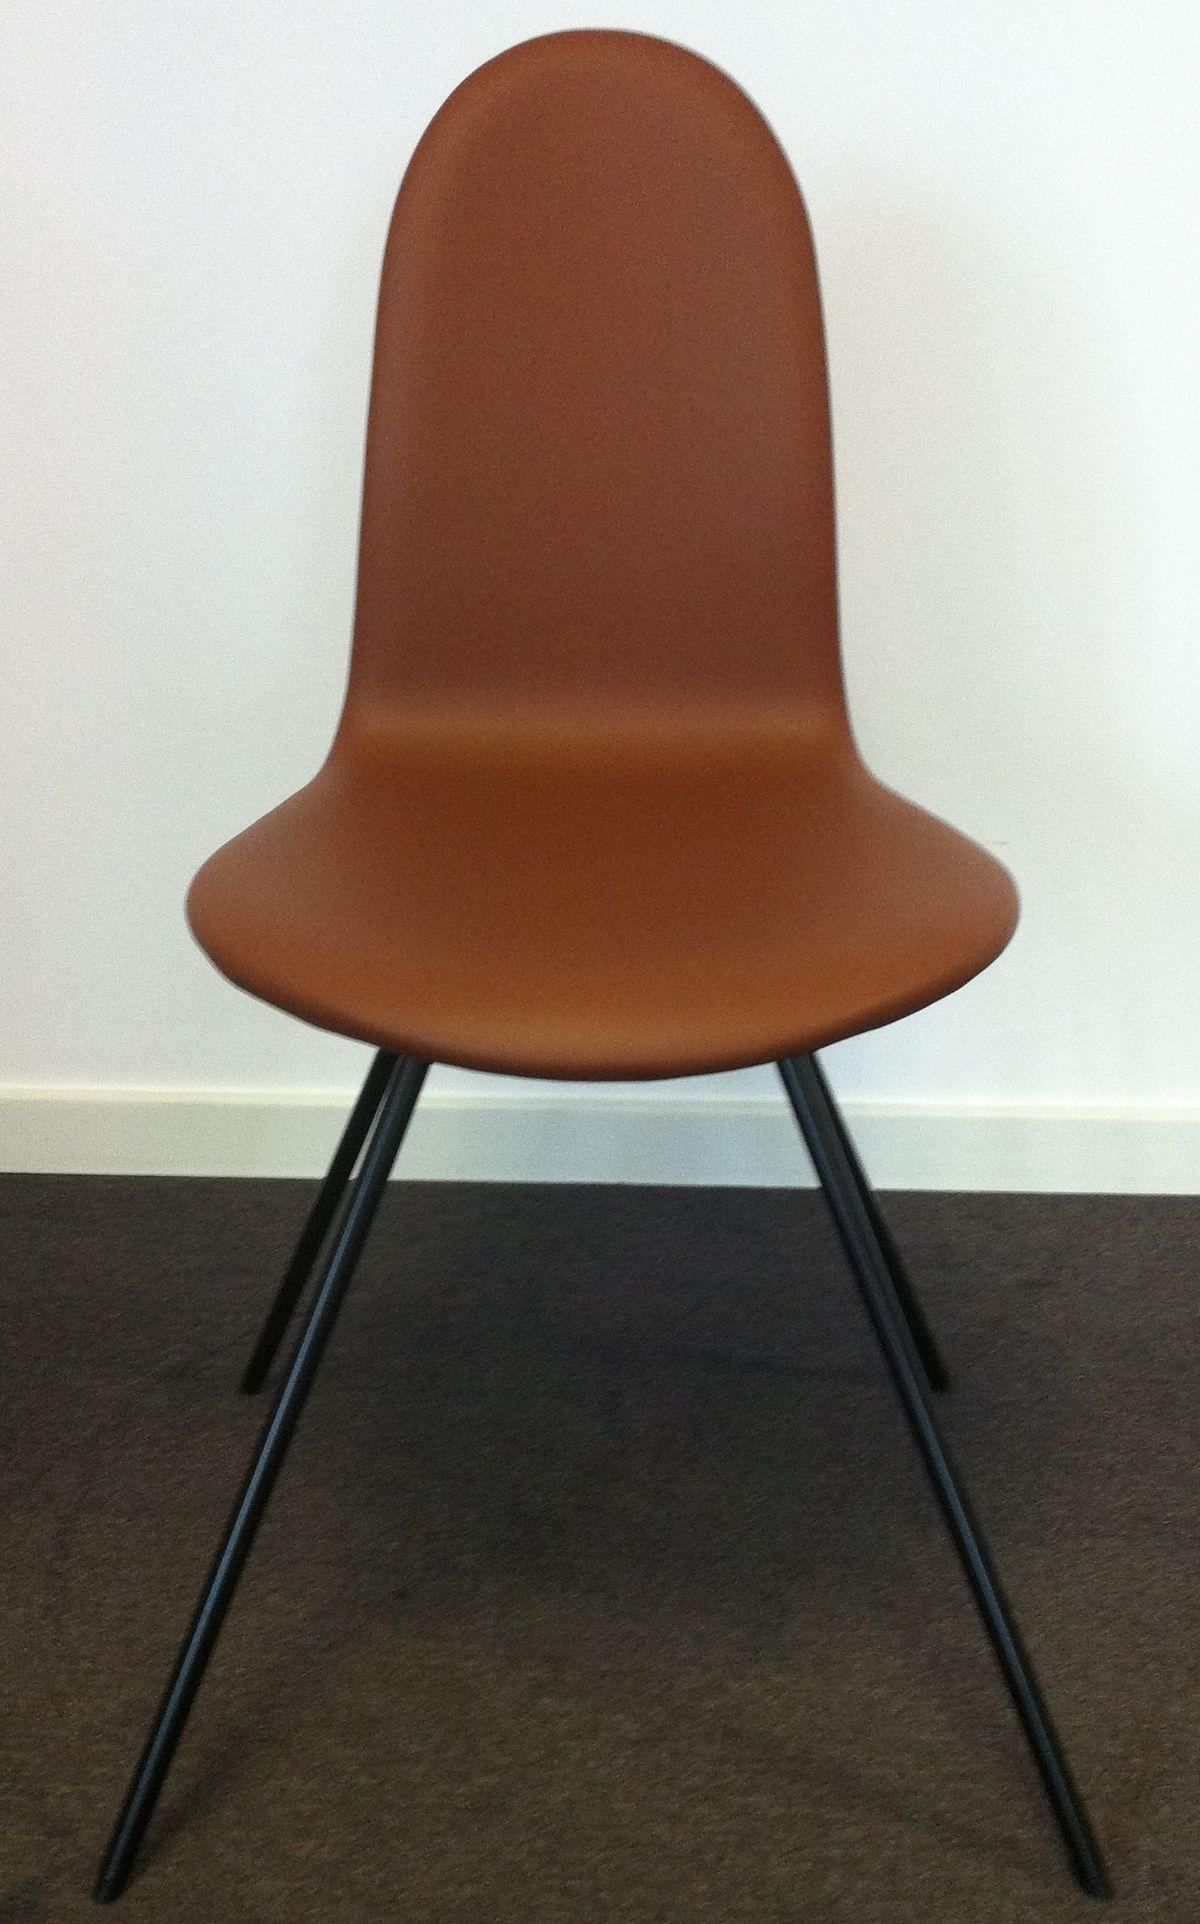 Tongue Chair Wikipedia